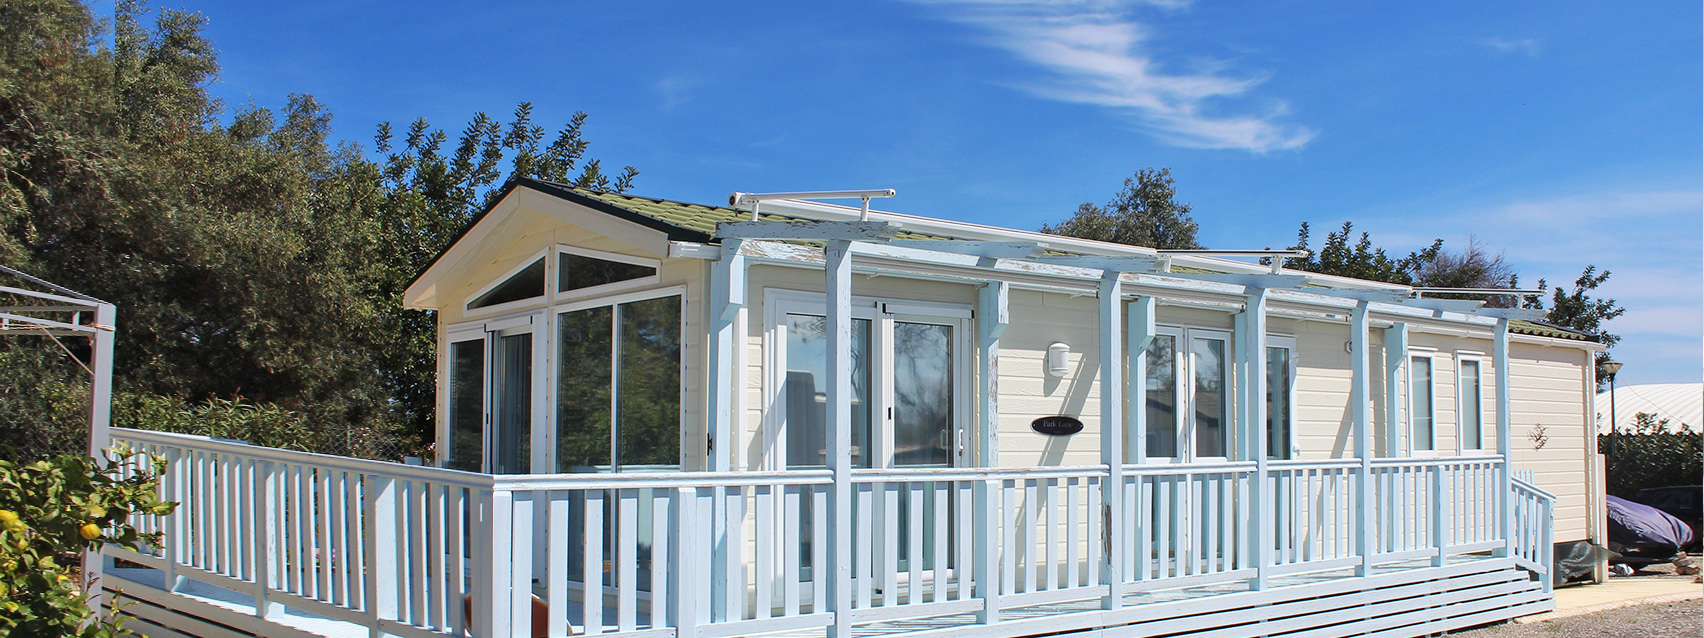 mobile homes in Camping Ria Formosa - Algarve